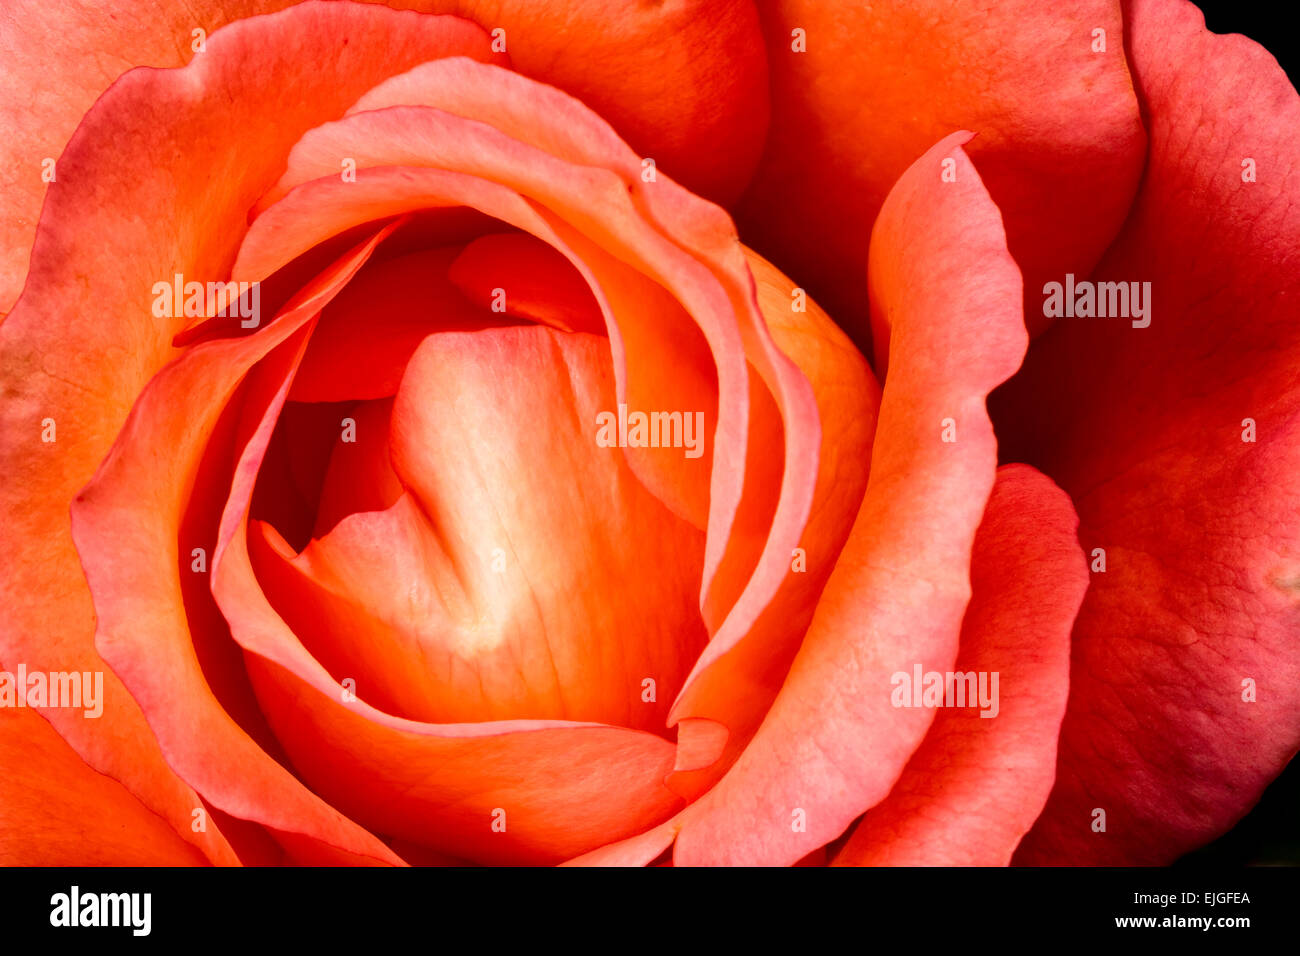 Orange Rose Blossom - Stock Image